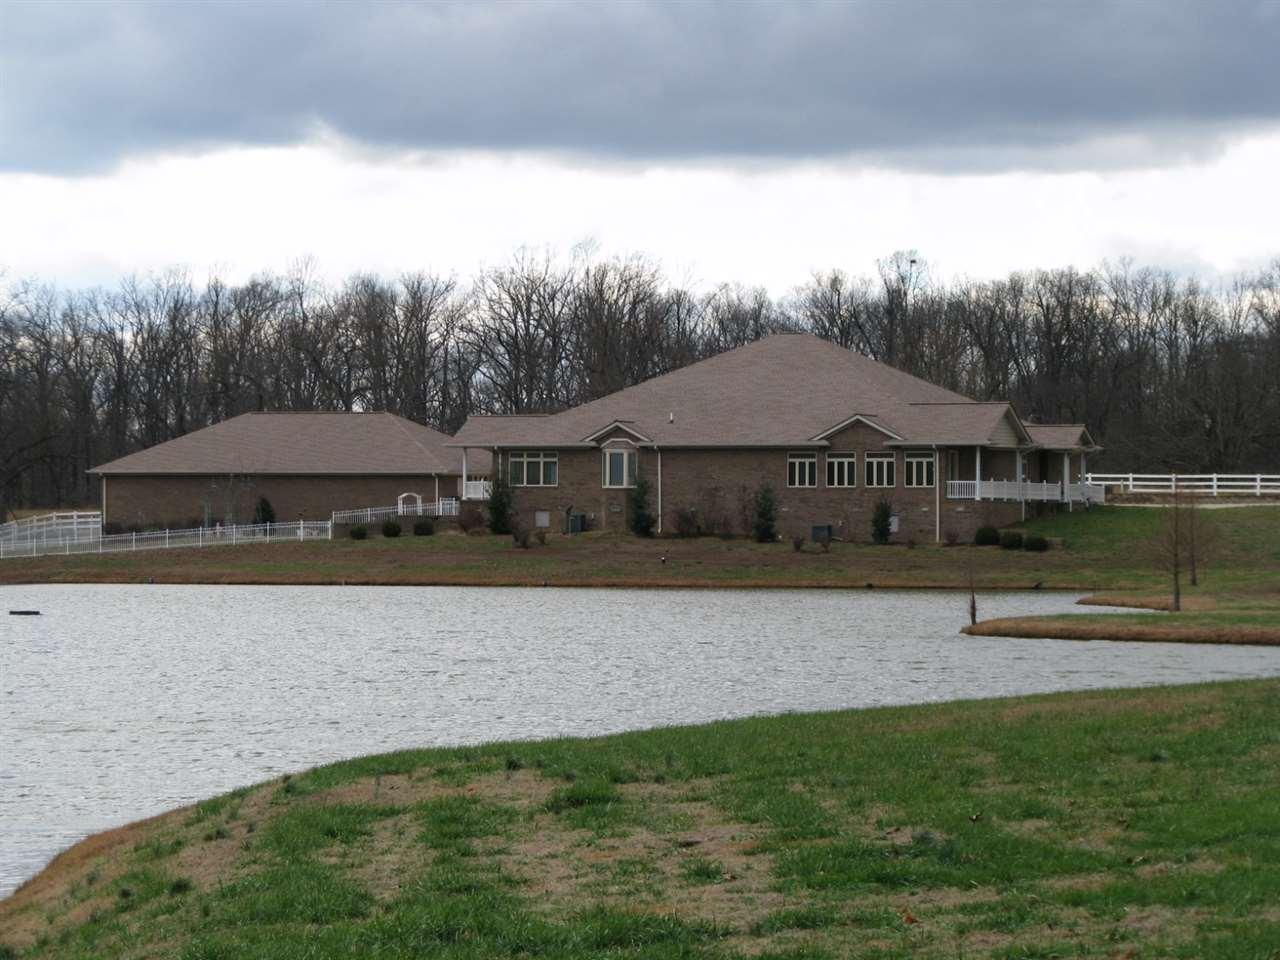 Real Estate for Sale, ListingId: 36589327, Benton,KY42025